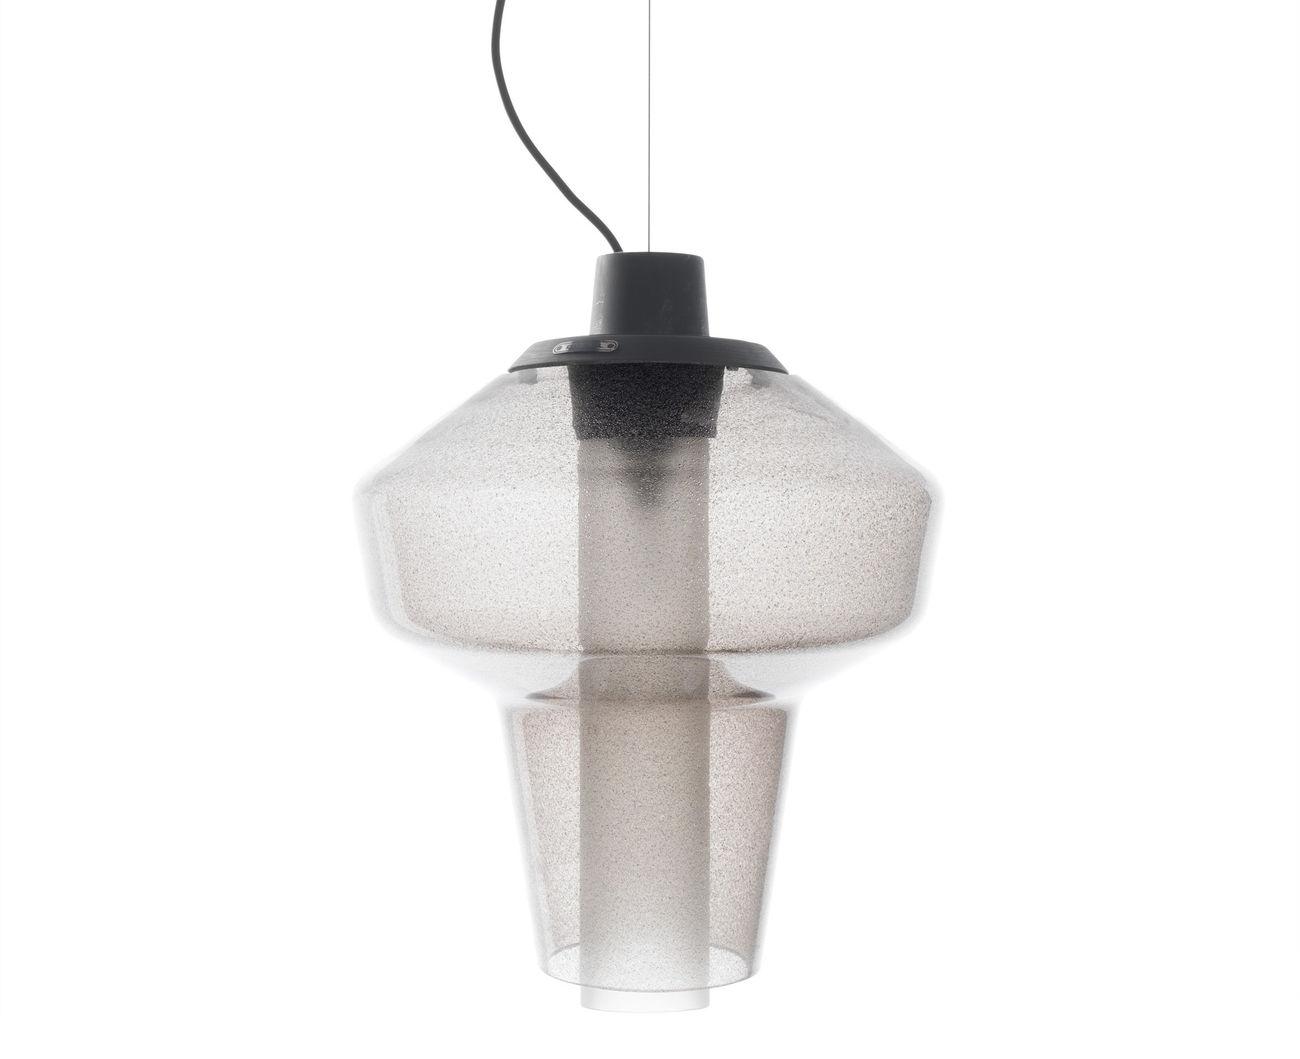 Diesel with Foscarini hanglamp Metal Glass-Grijs-nr. 2